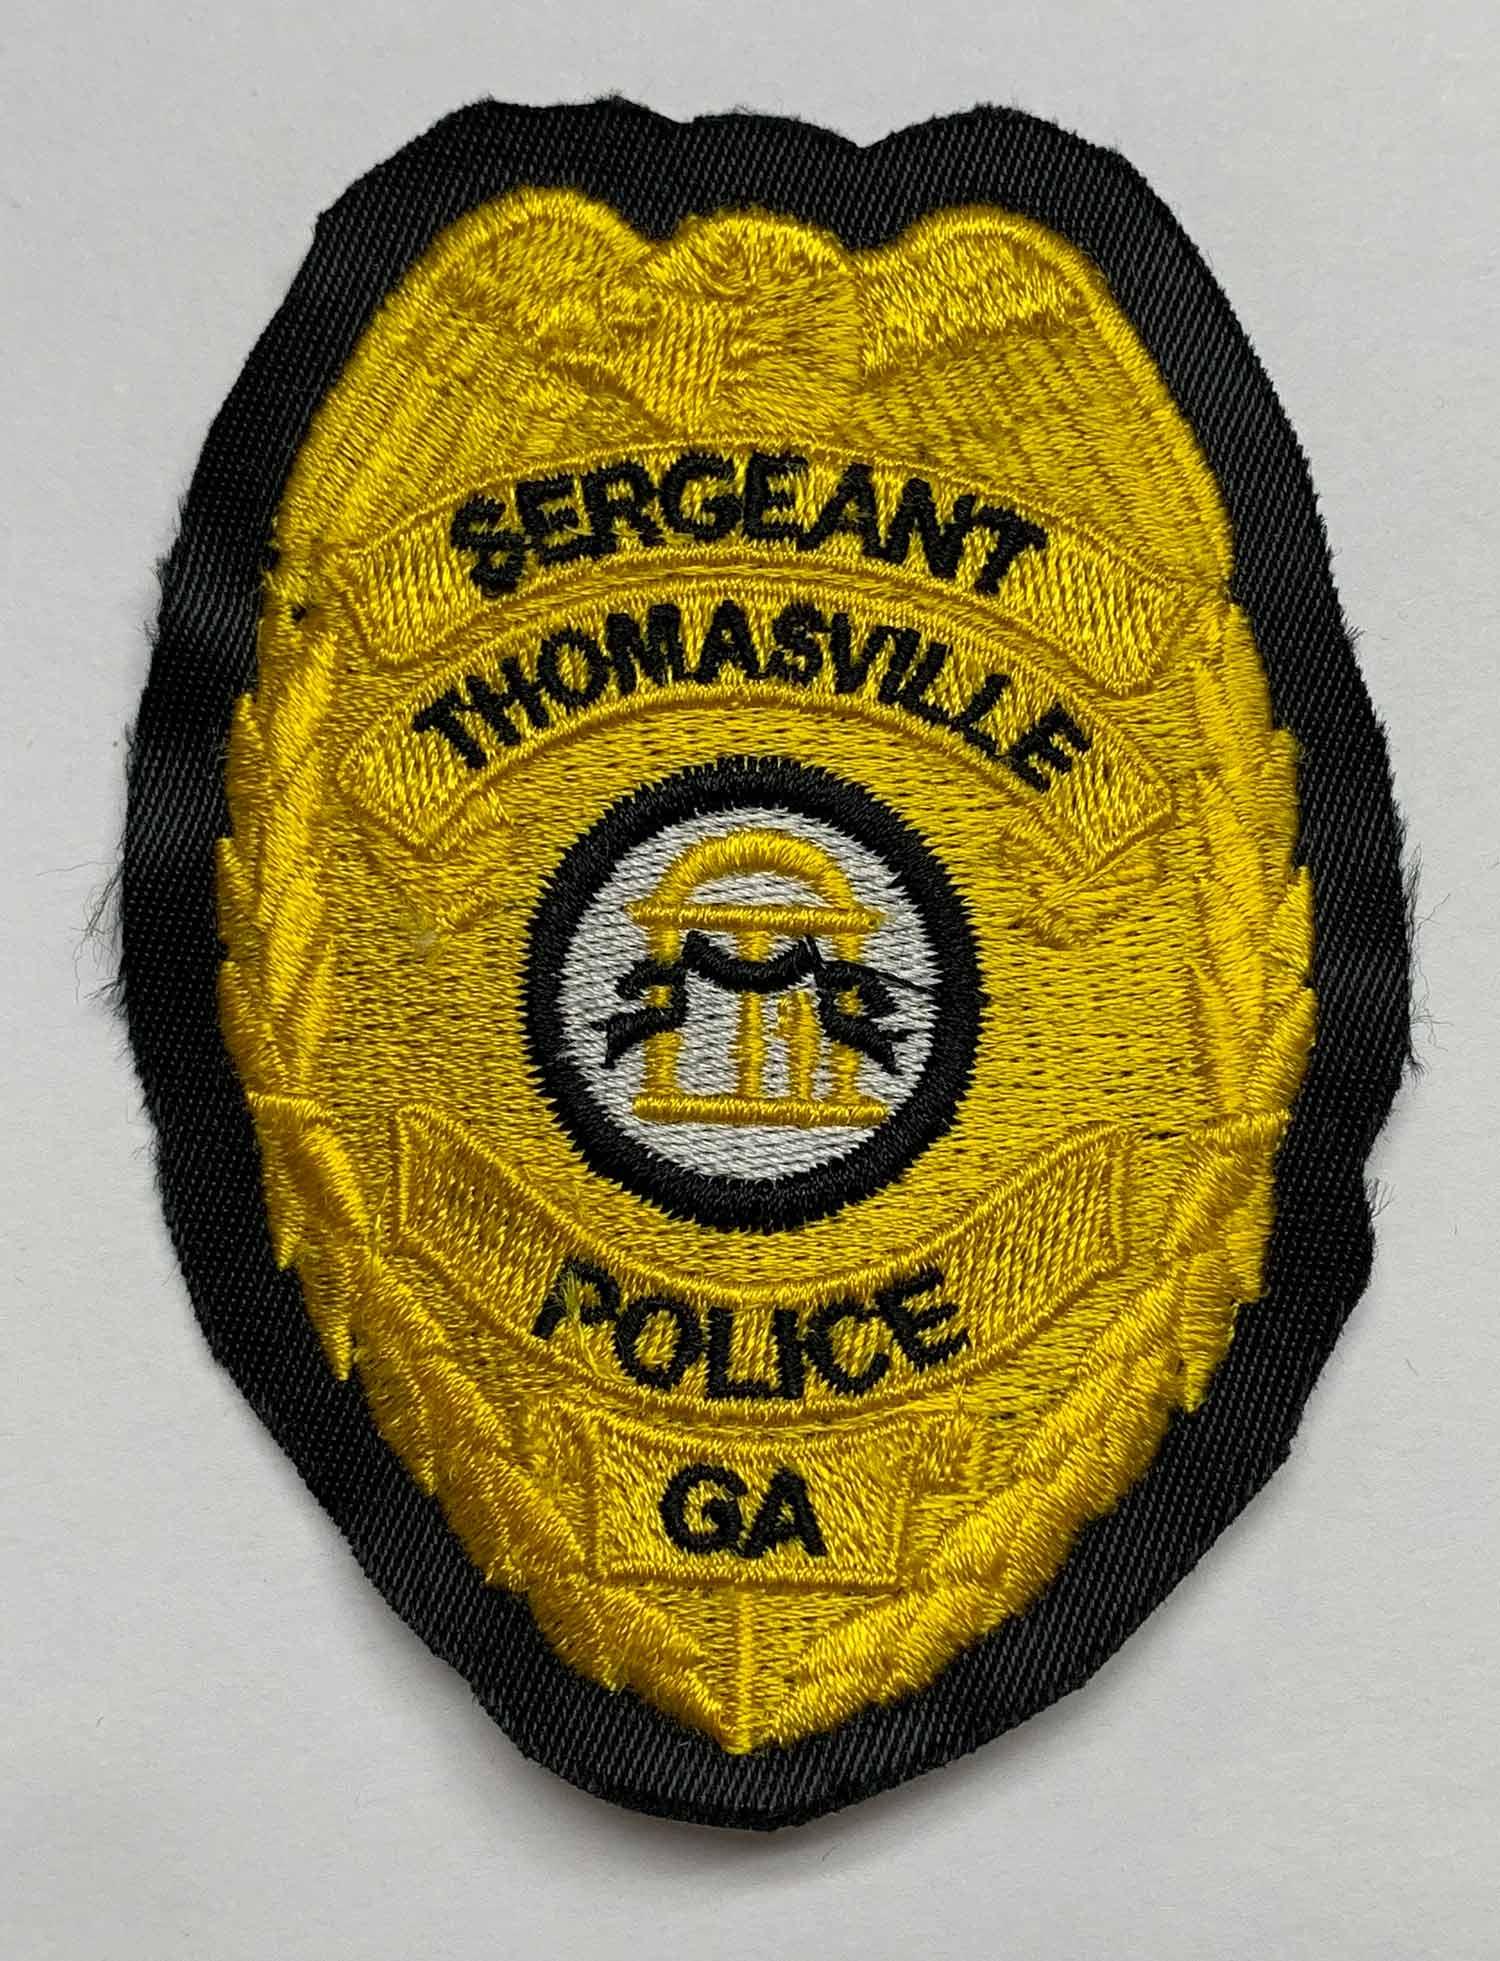 KYC_SERGEANT-THOMASVILLE-GA-POLICE_web.jpg